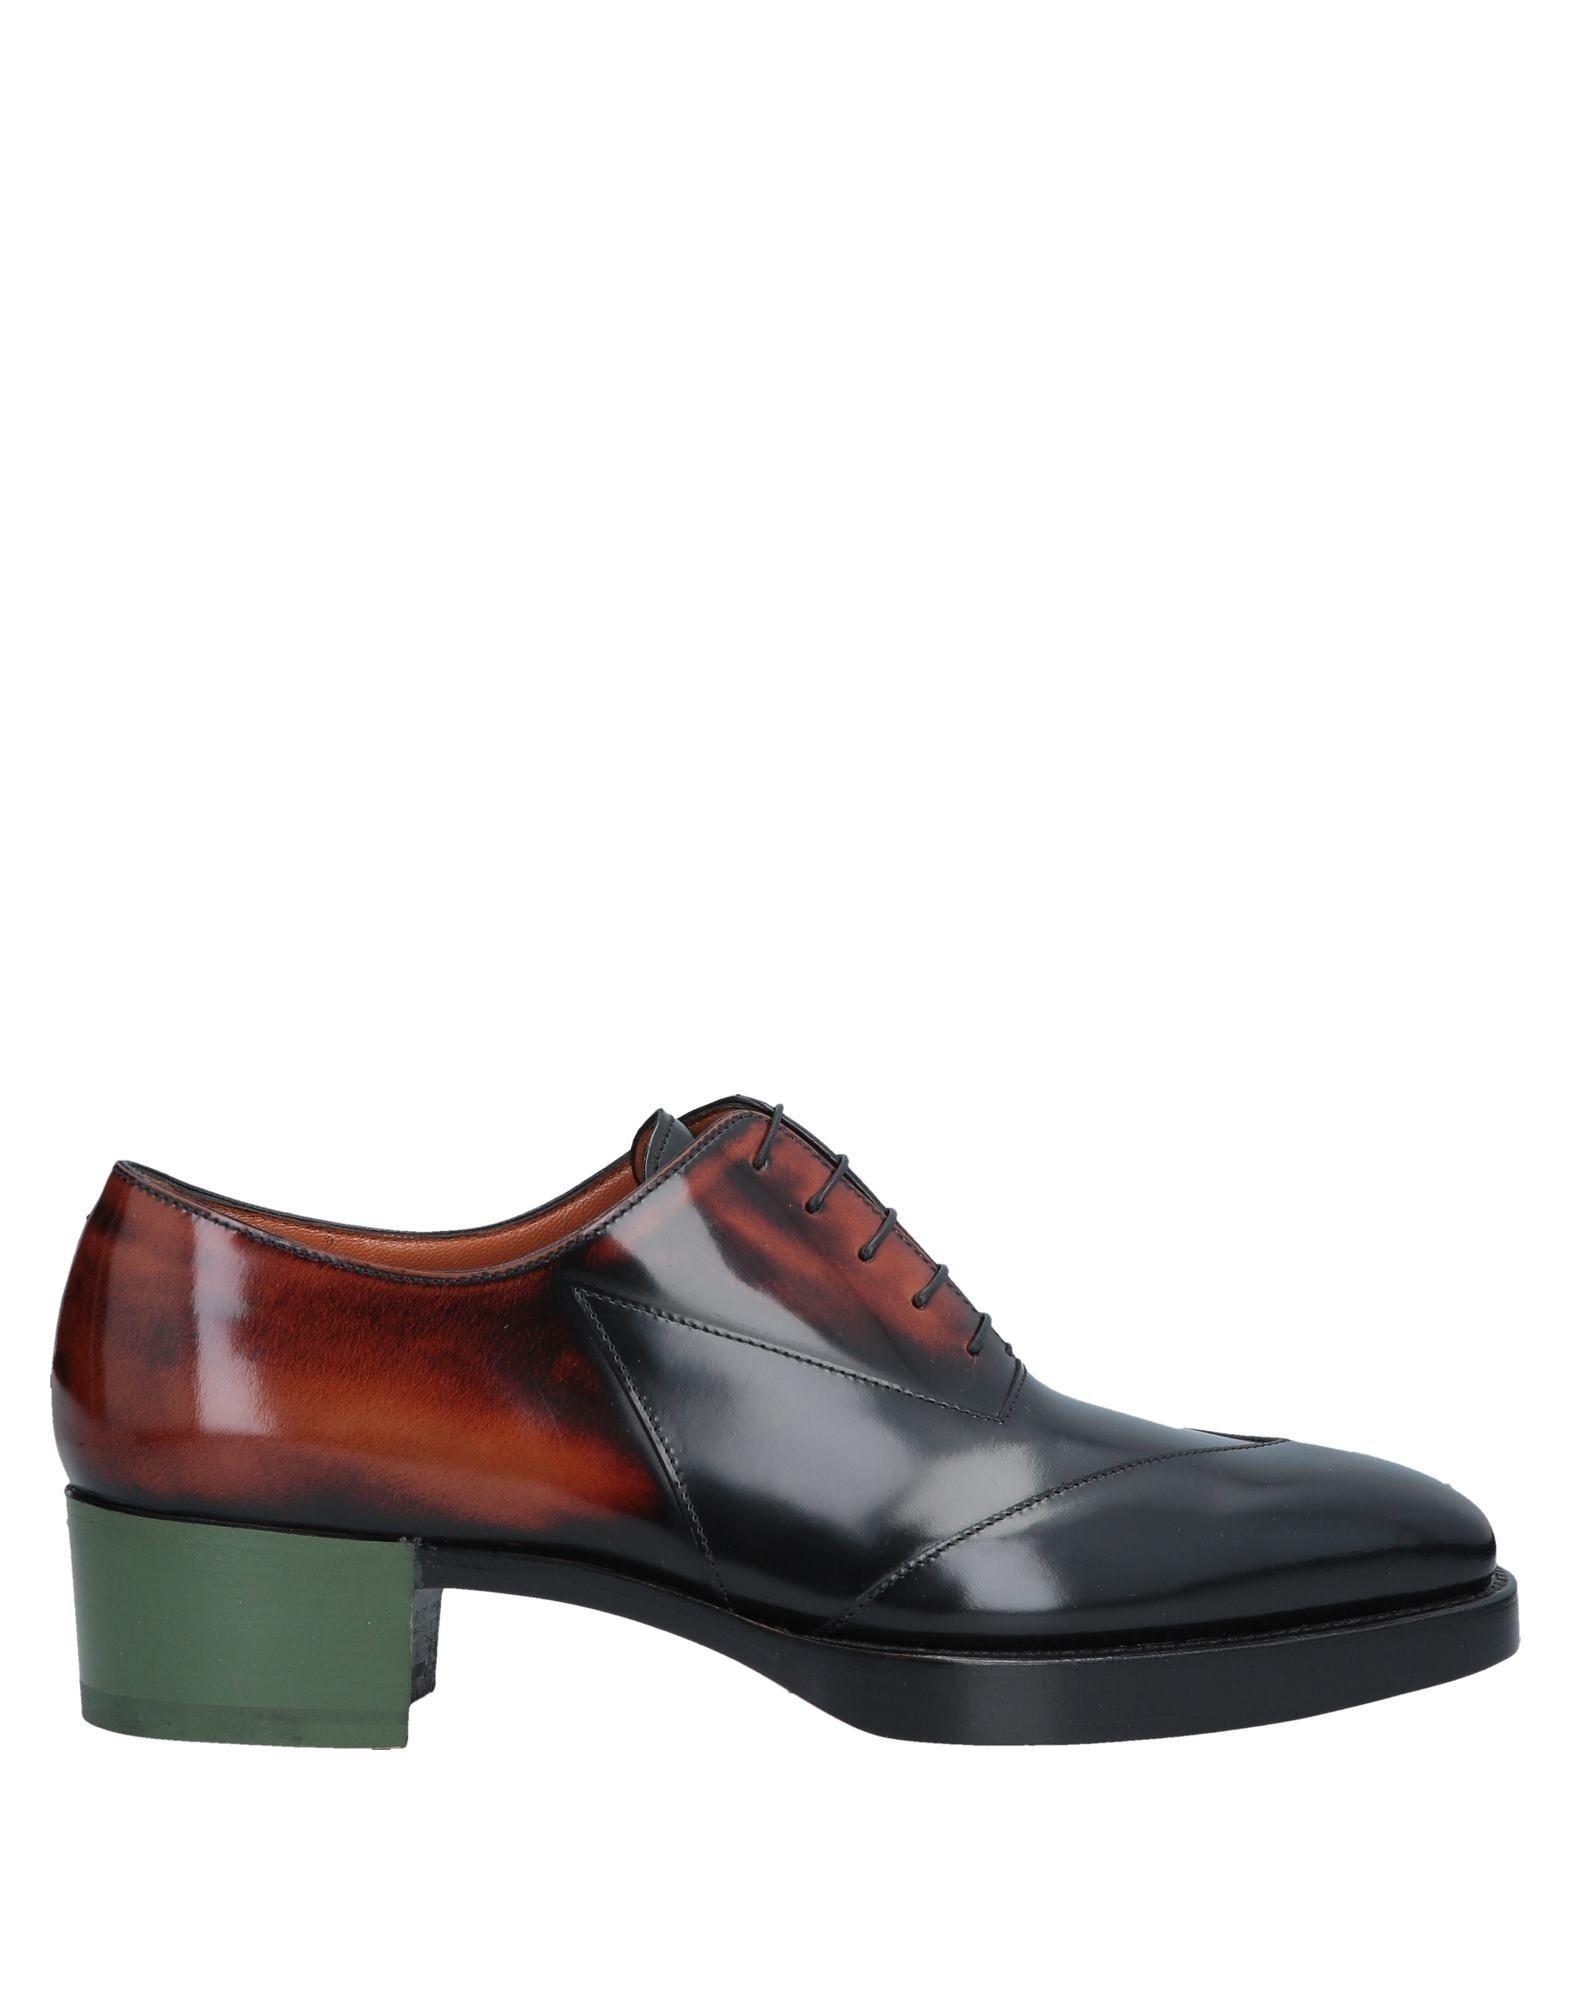 Фото - WALTER VAN BEIRENDONCK Обувь на шнурках v persie van basten 556688